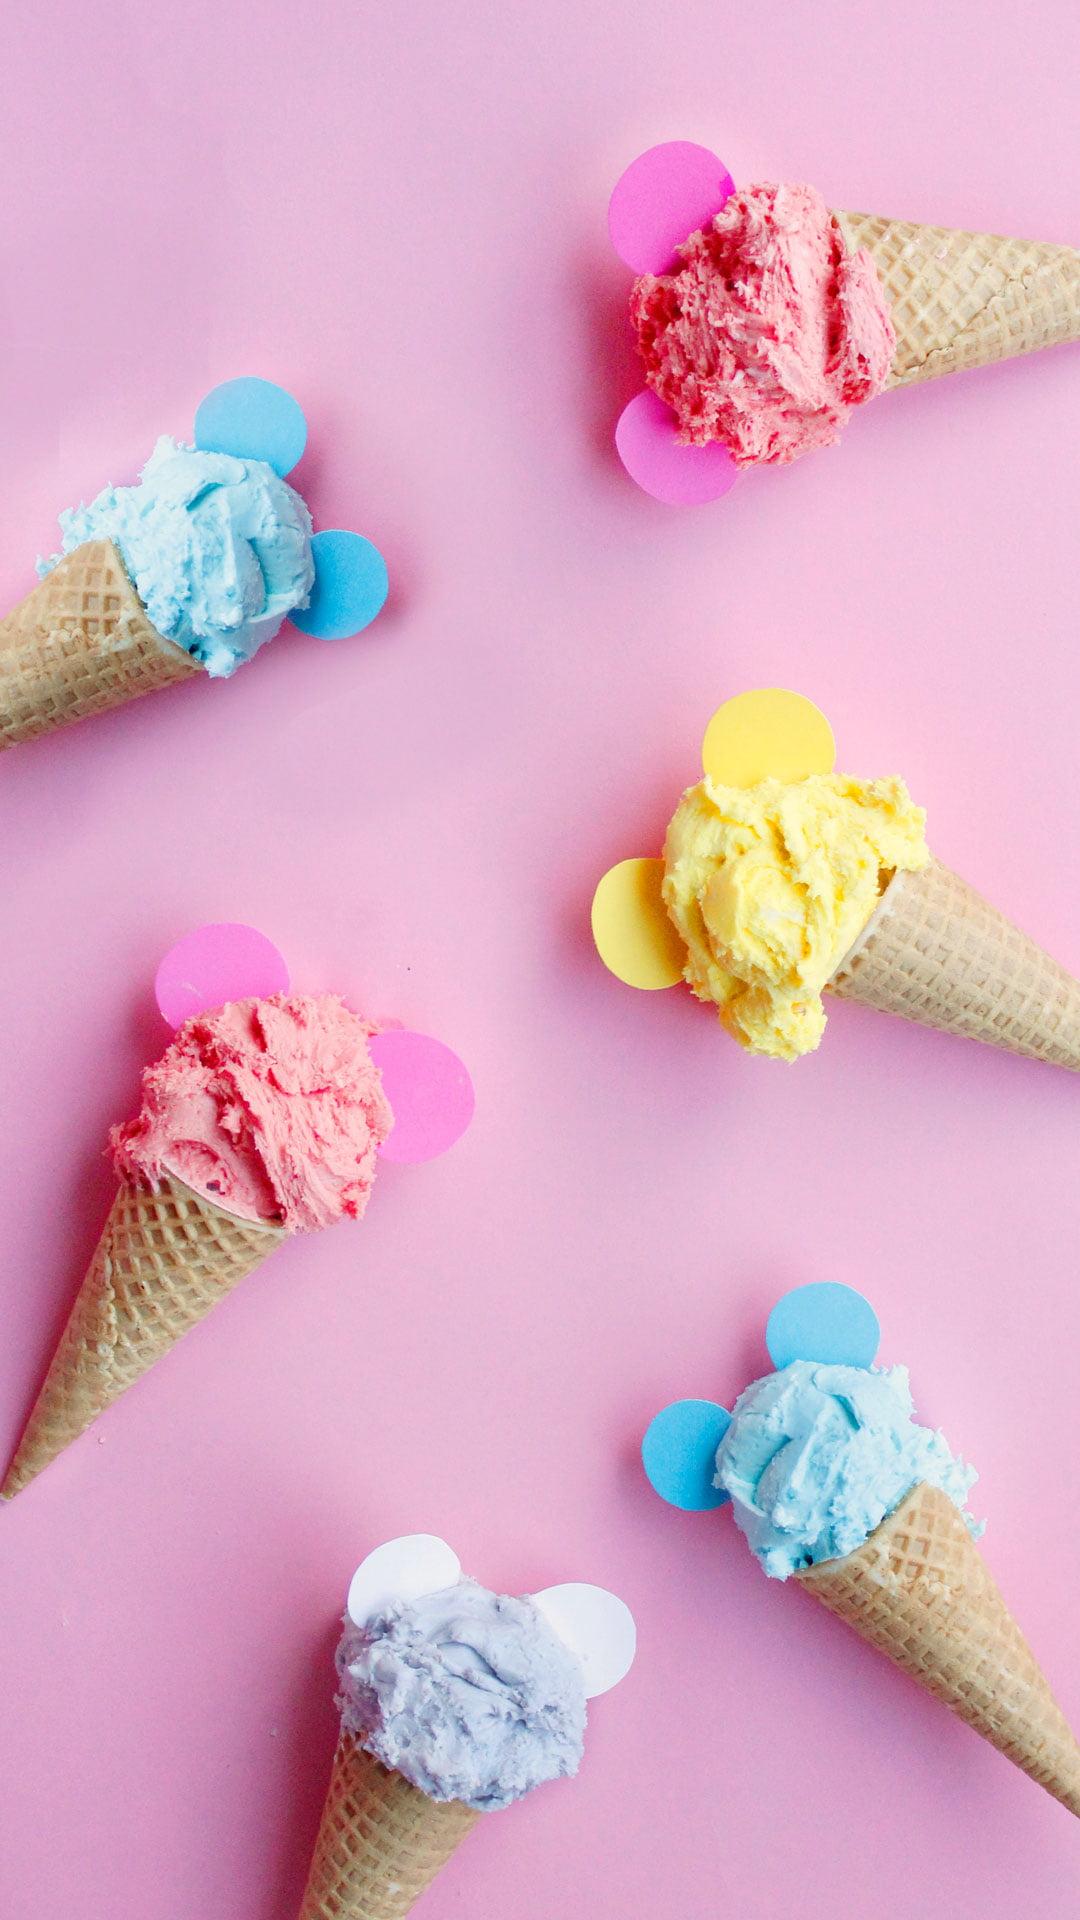 ice cream wallpaper 4